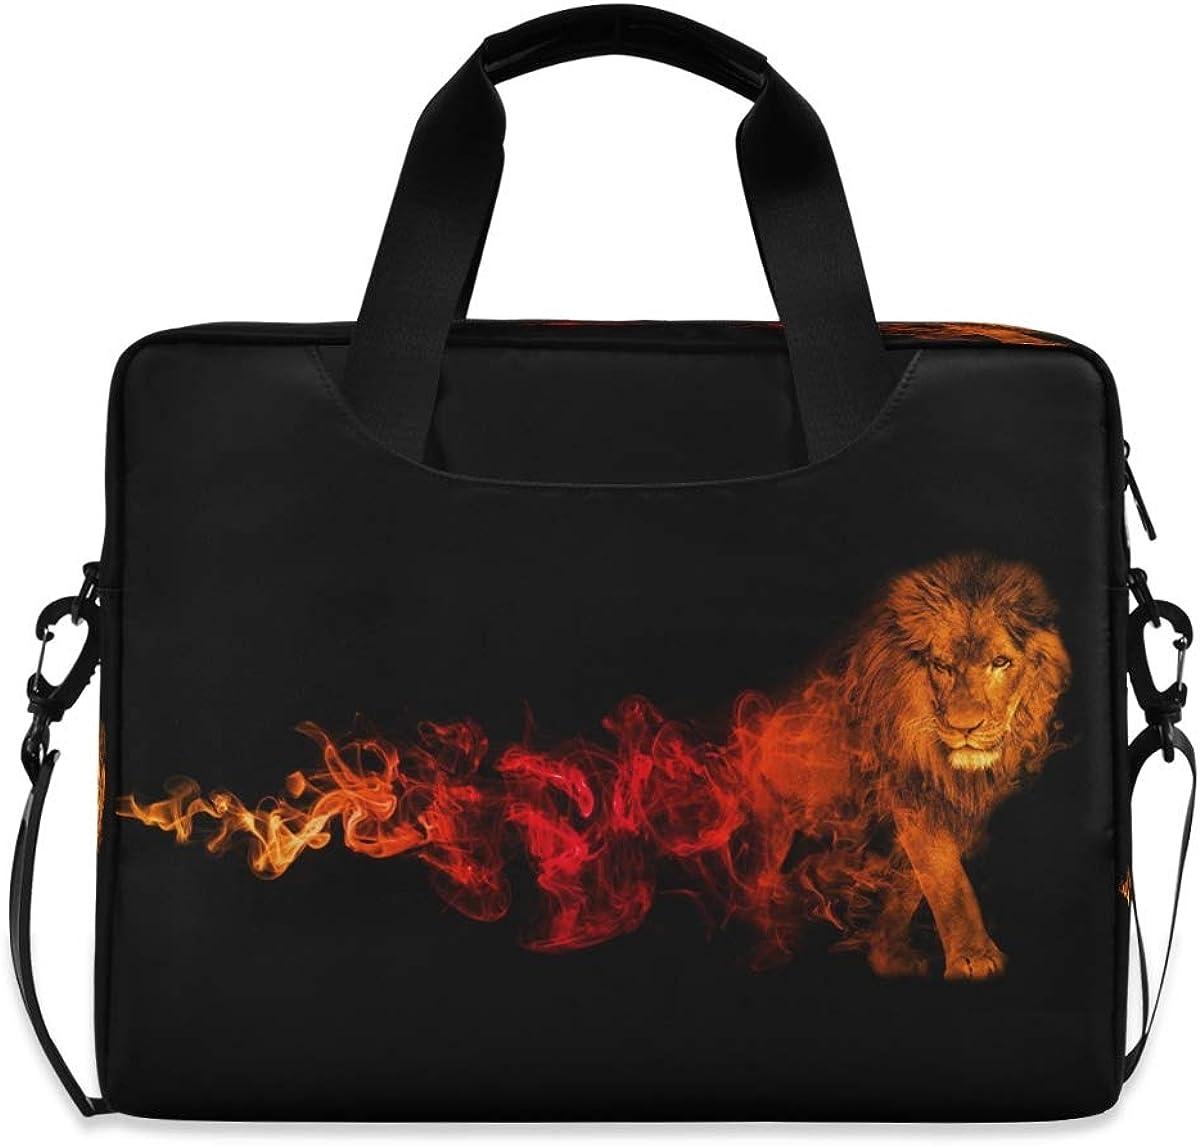 LELEGO Fire Lion New Orleans Mall Flame Animal Ranking TOP11 Shoulder Car Laptop Bag